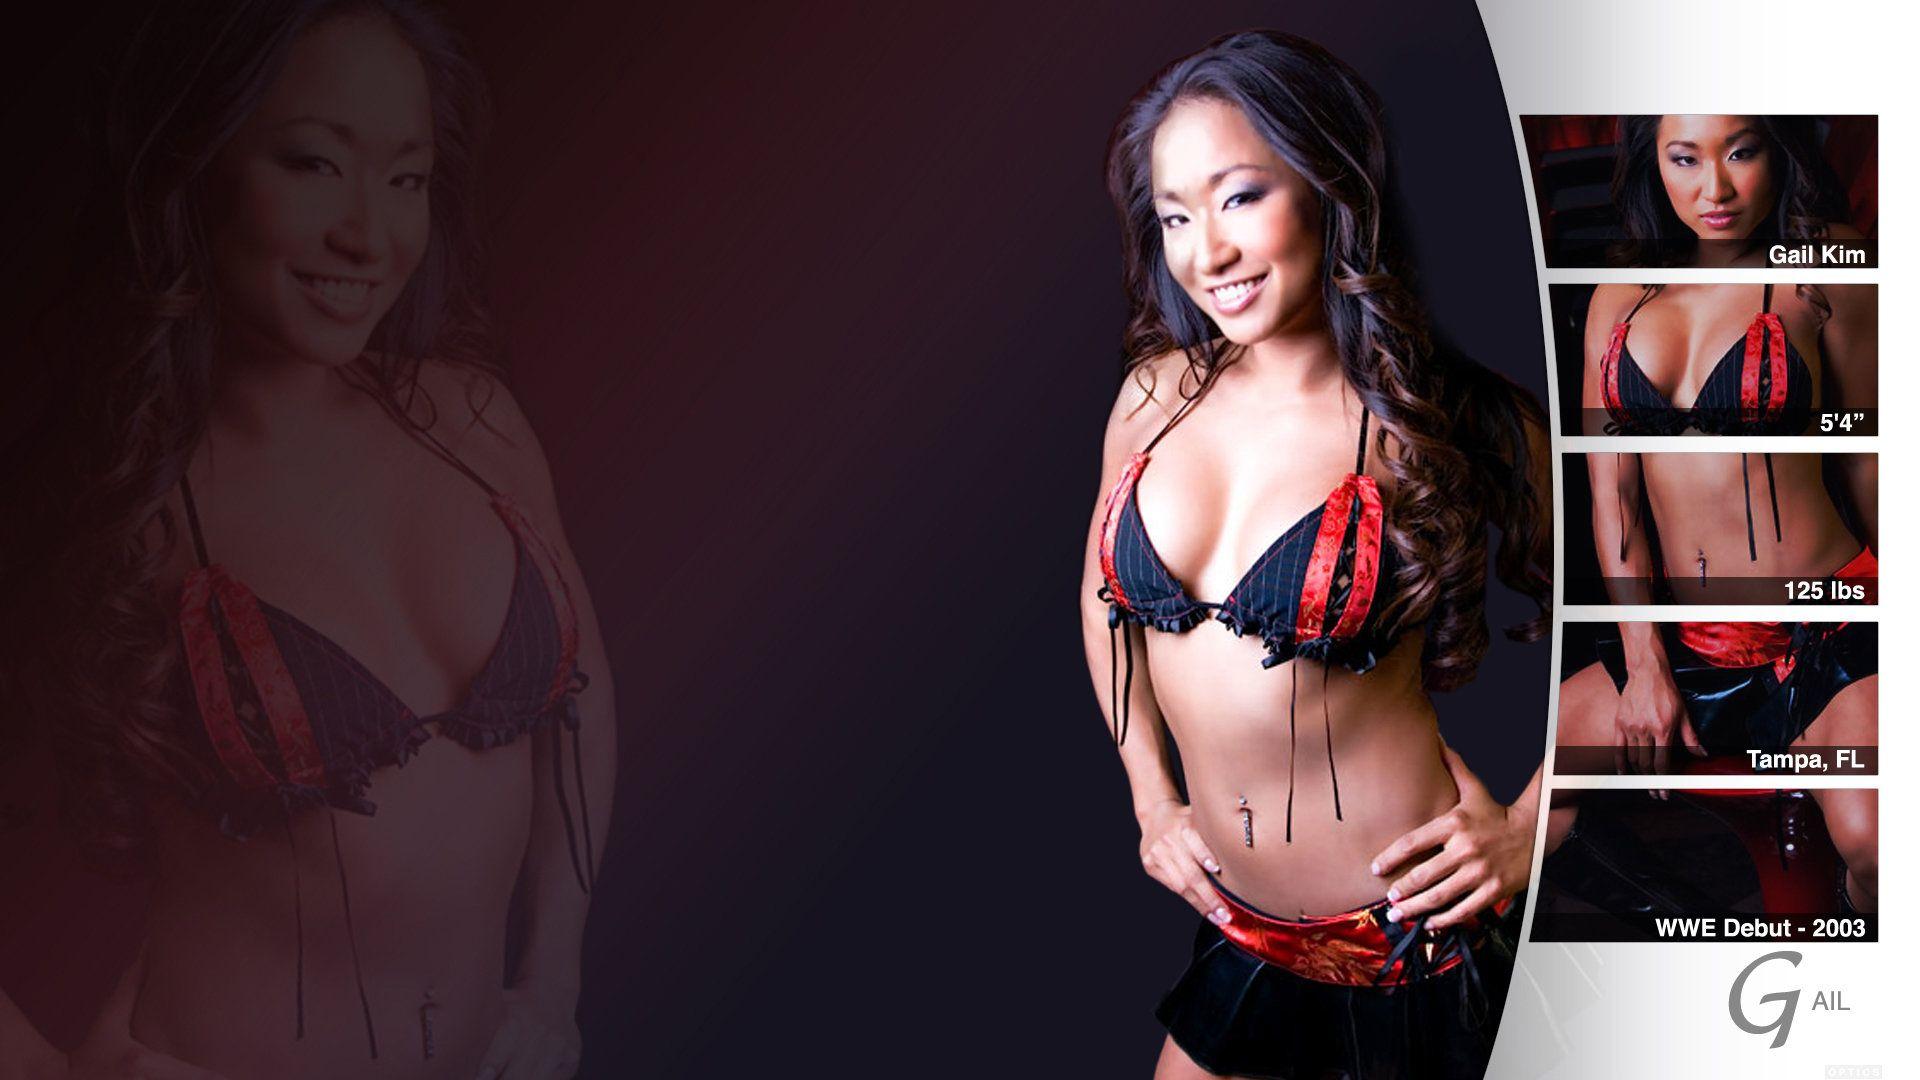 Gail Kim Hot Images gail kim - hot & sexy - gail kim wallpaper (42976511) - fanpop